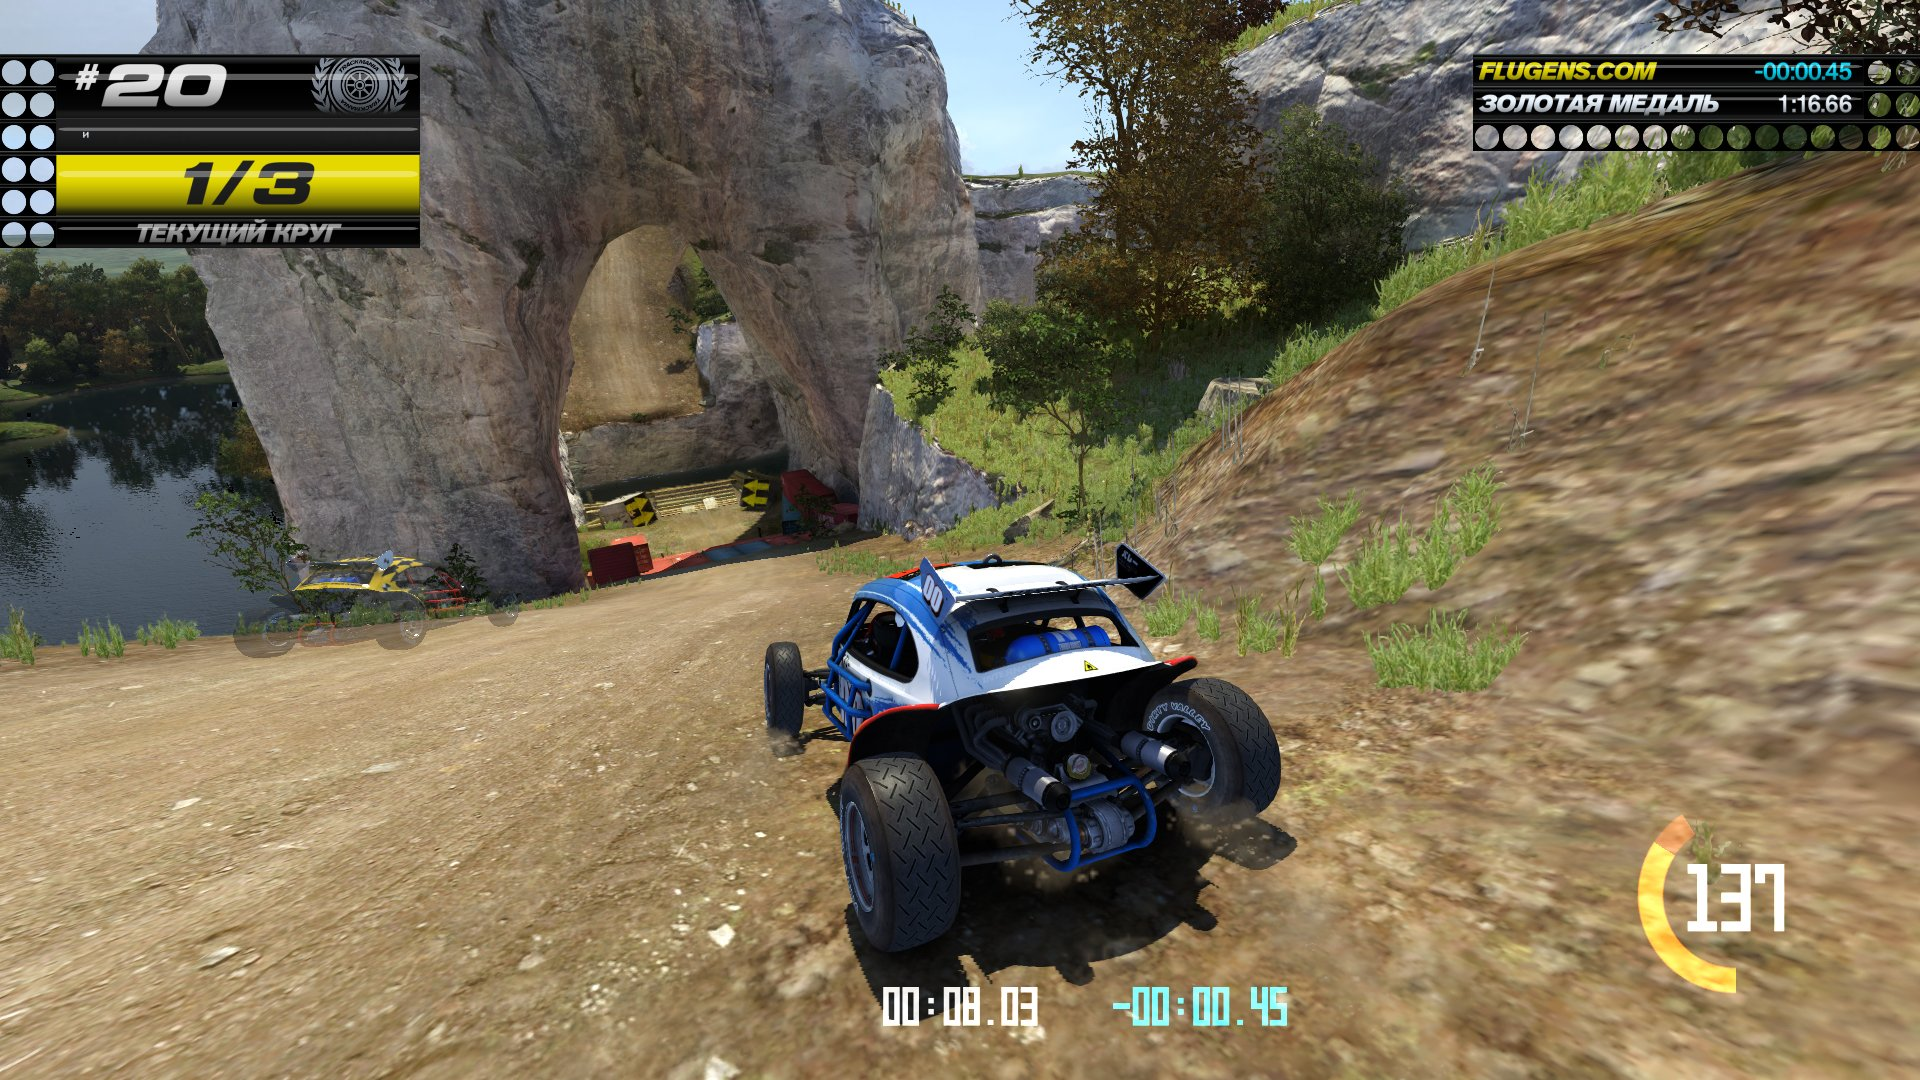 Обзор TrackMania Turbo. - Изображение 4